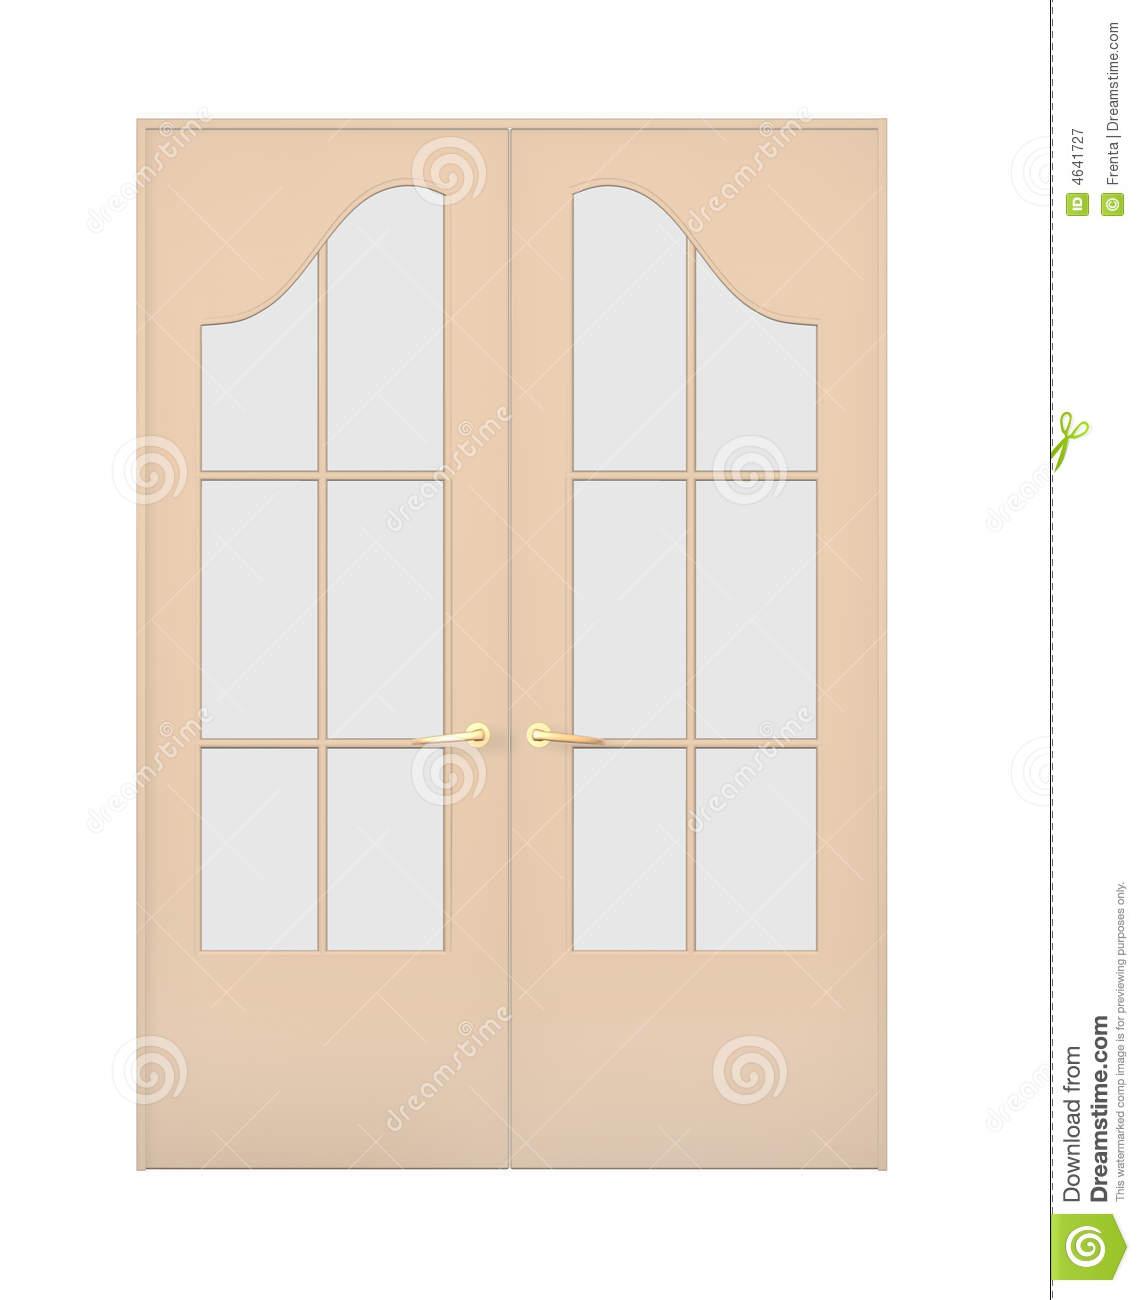 Closed double door clipart clip art library Closed Double Door Clipart Inspiration 22109 Doors - hyunky.com clip art library